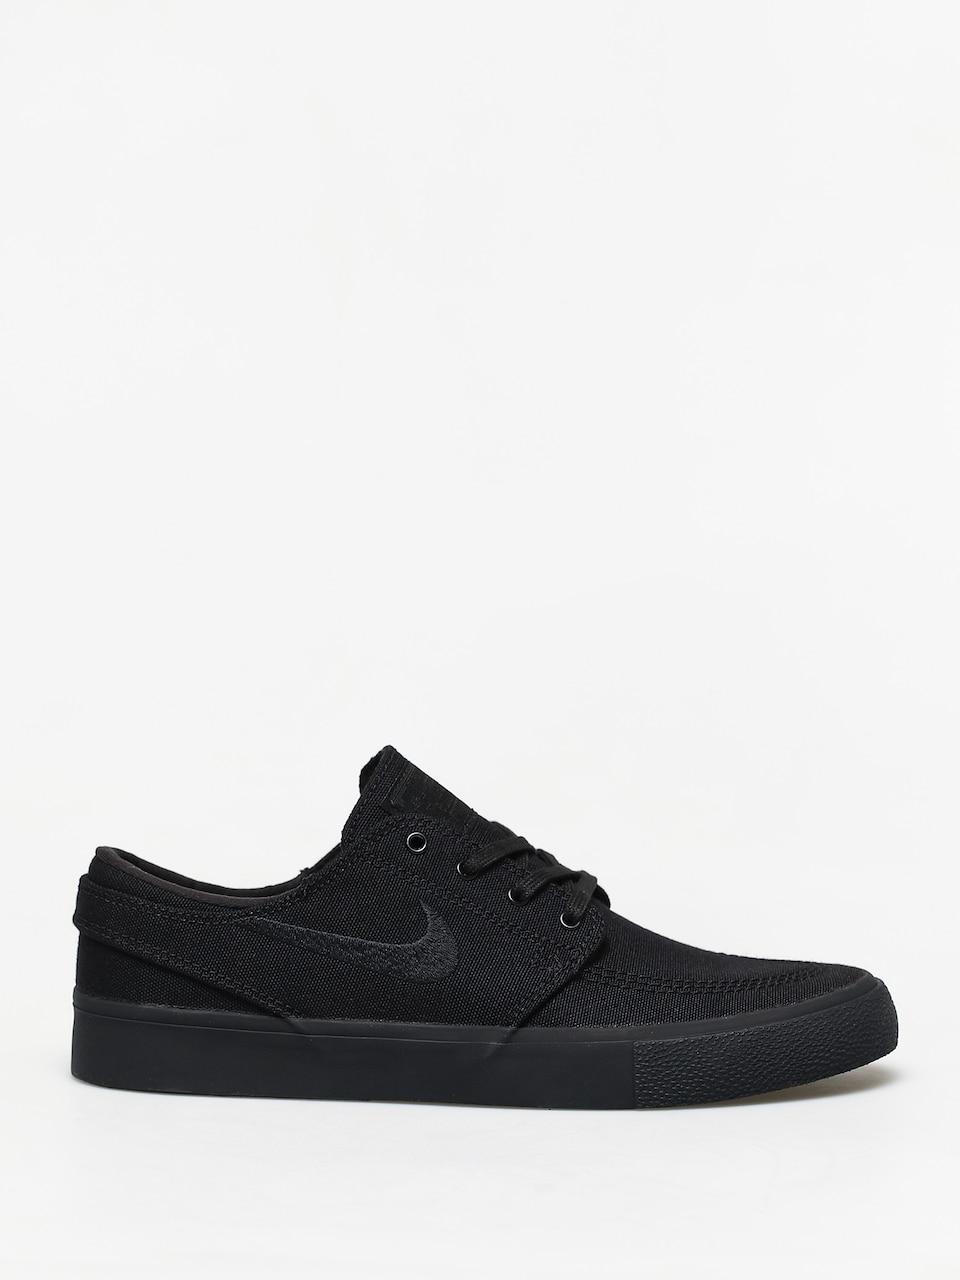 Nike STEFAN JANOSKI MD Port Wine Black Gum Dark Discounted 182 Men/'s Shoes